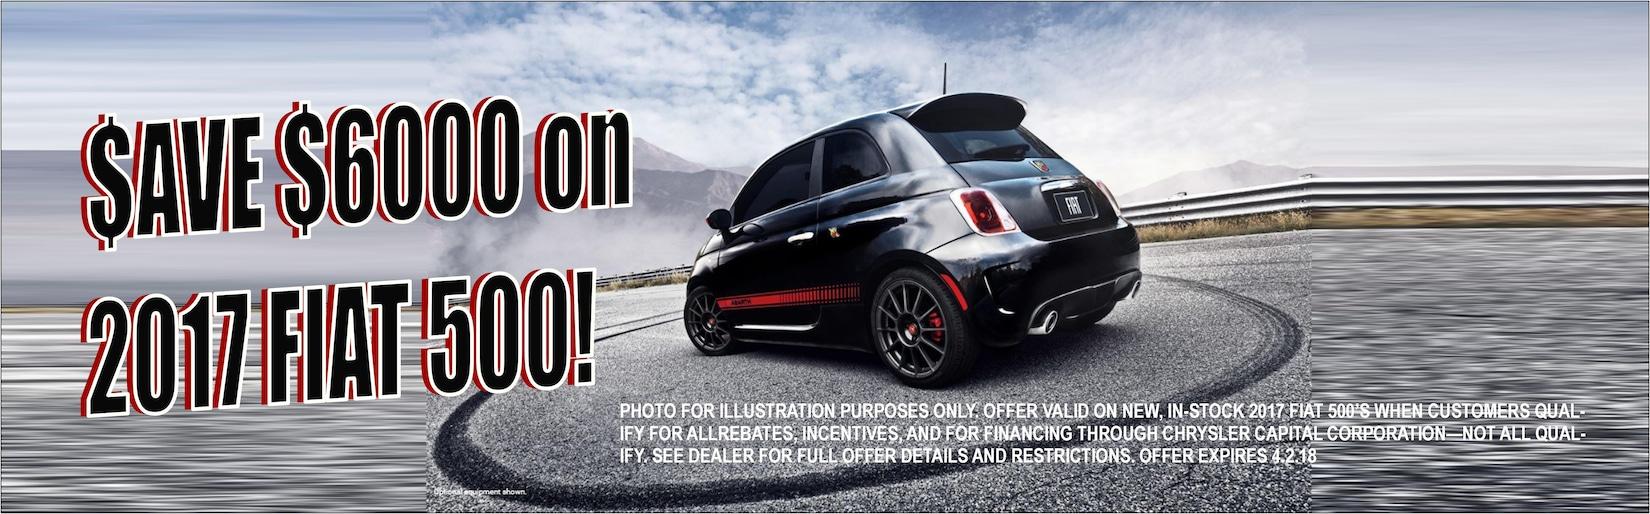 Audi danbury hours 15